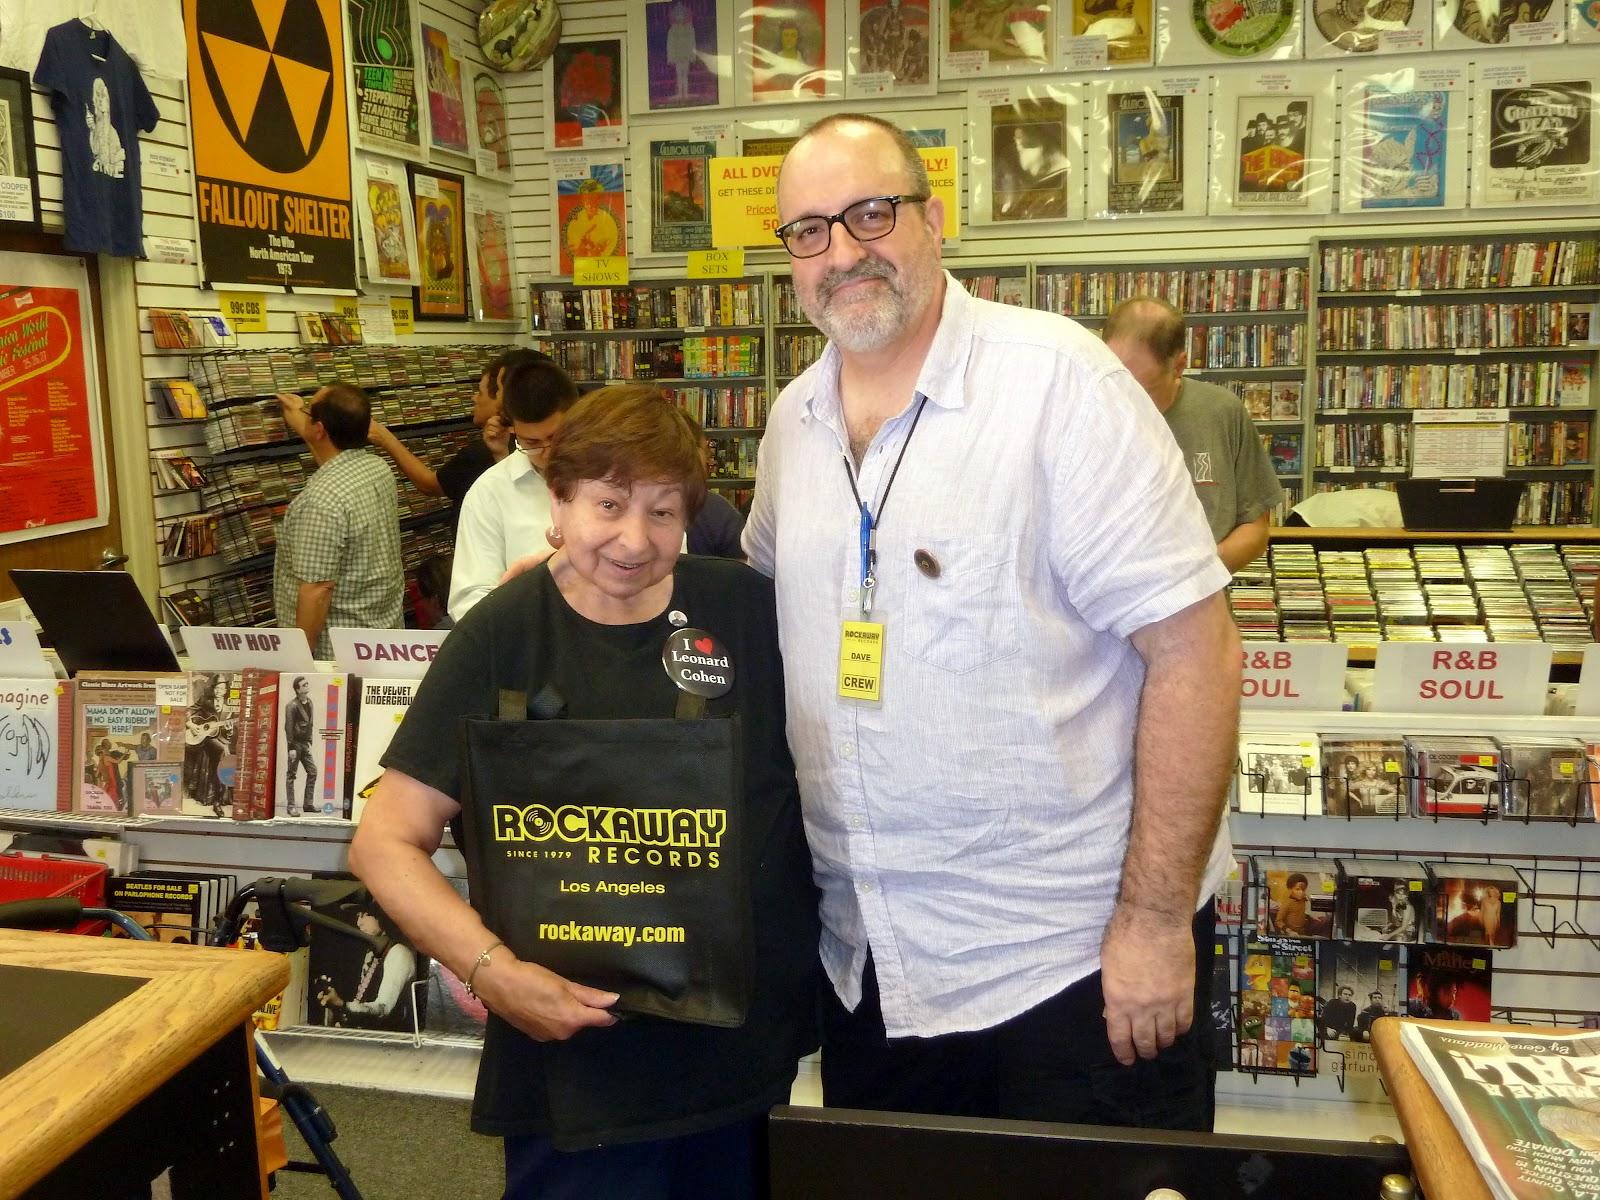 Arlenes Leonard Cohen Scrapbook My Fun Record Store Day In Los